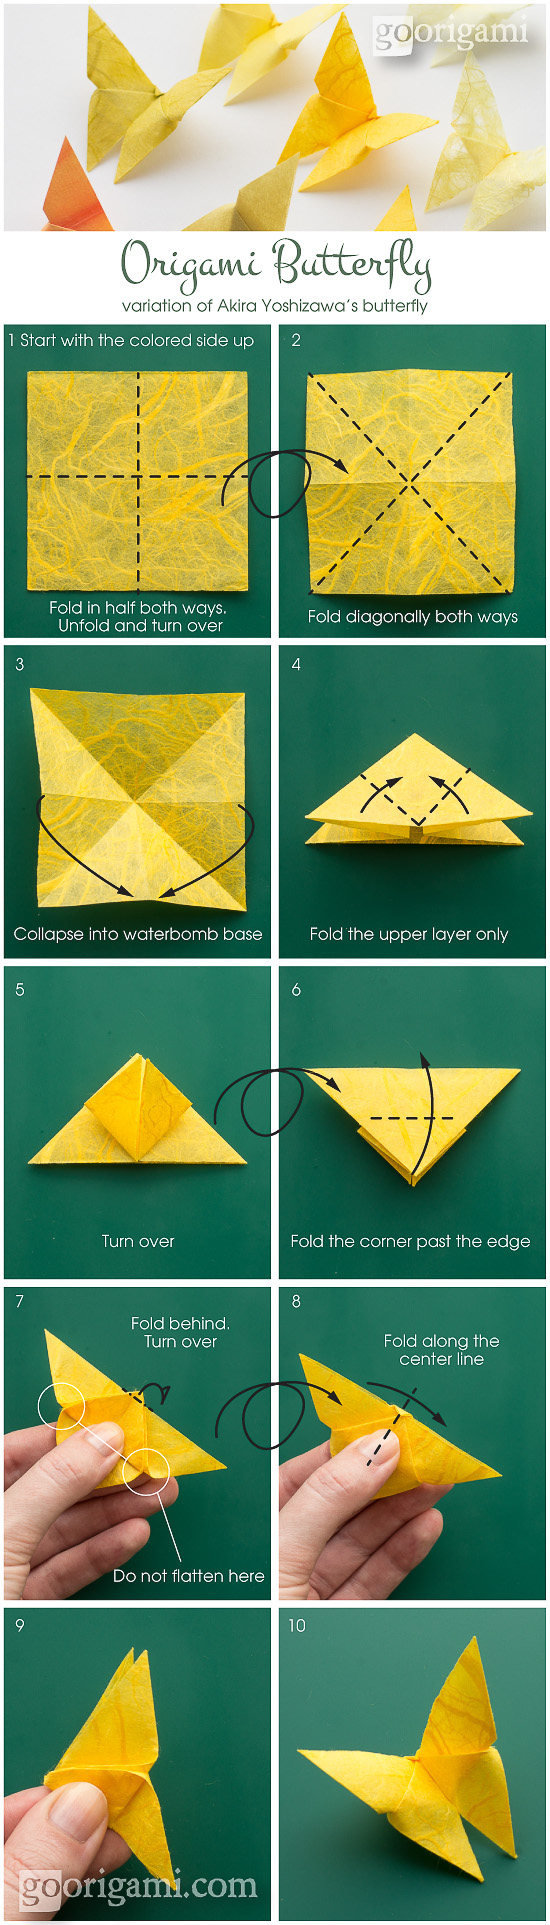 pasos para mariposa en origami